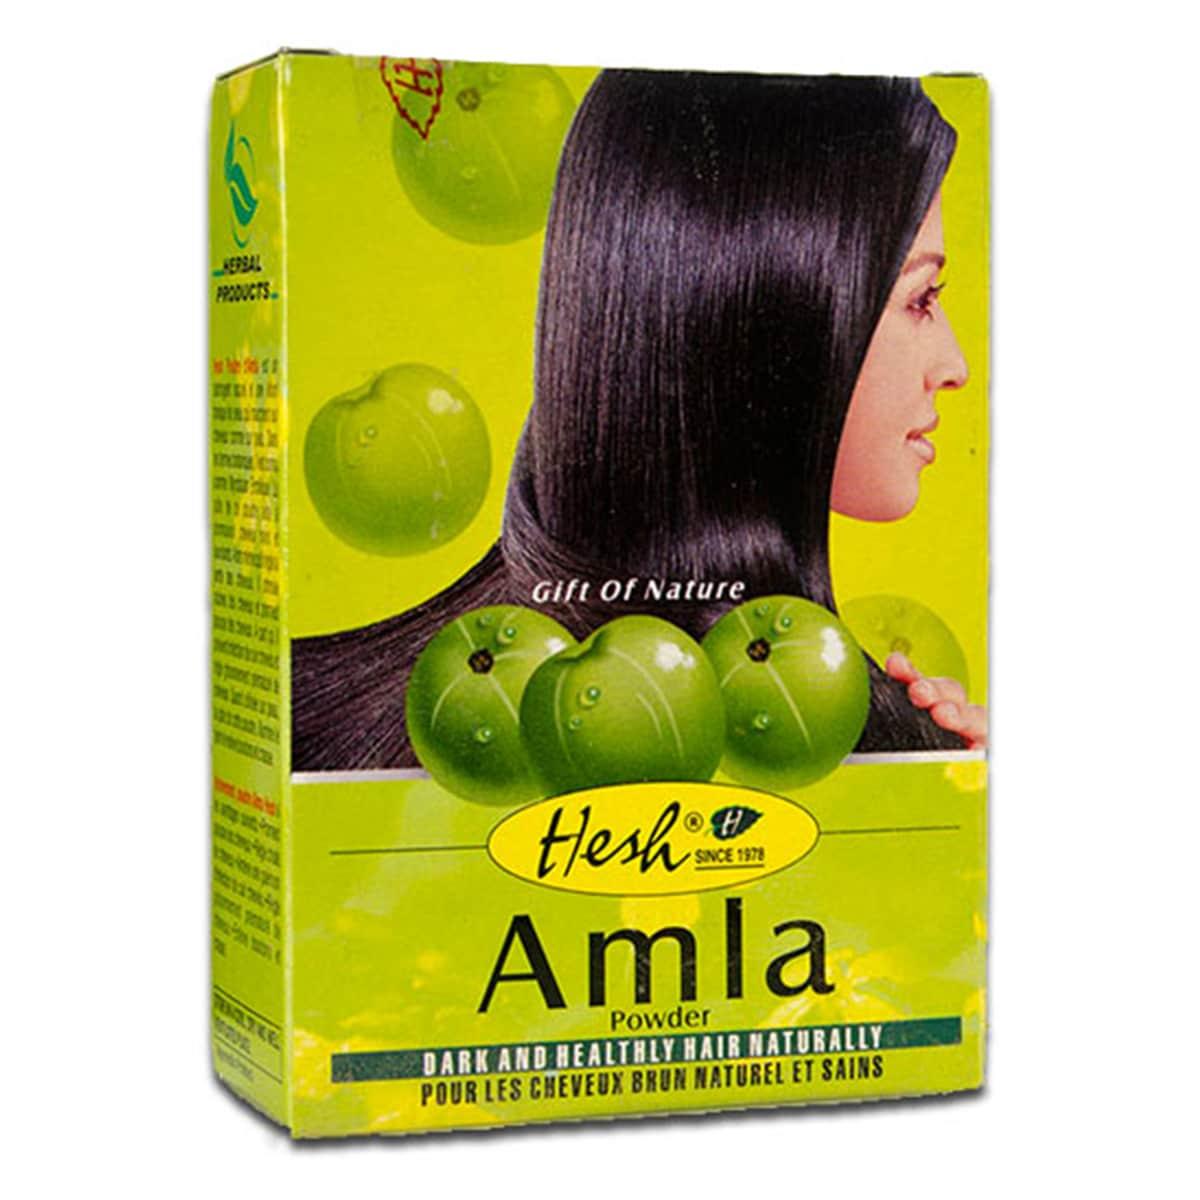 Buy Hesh Amla Powder - 100 gm